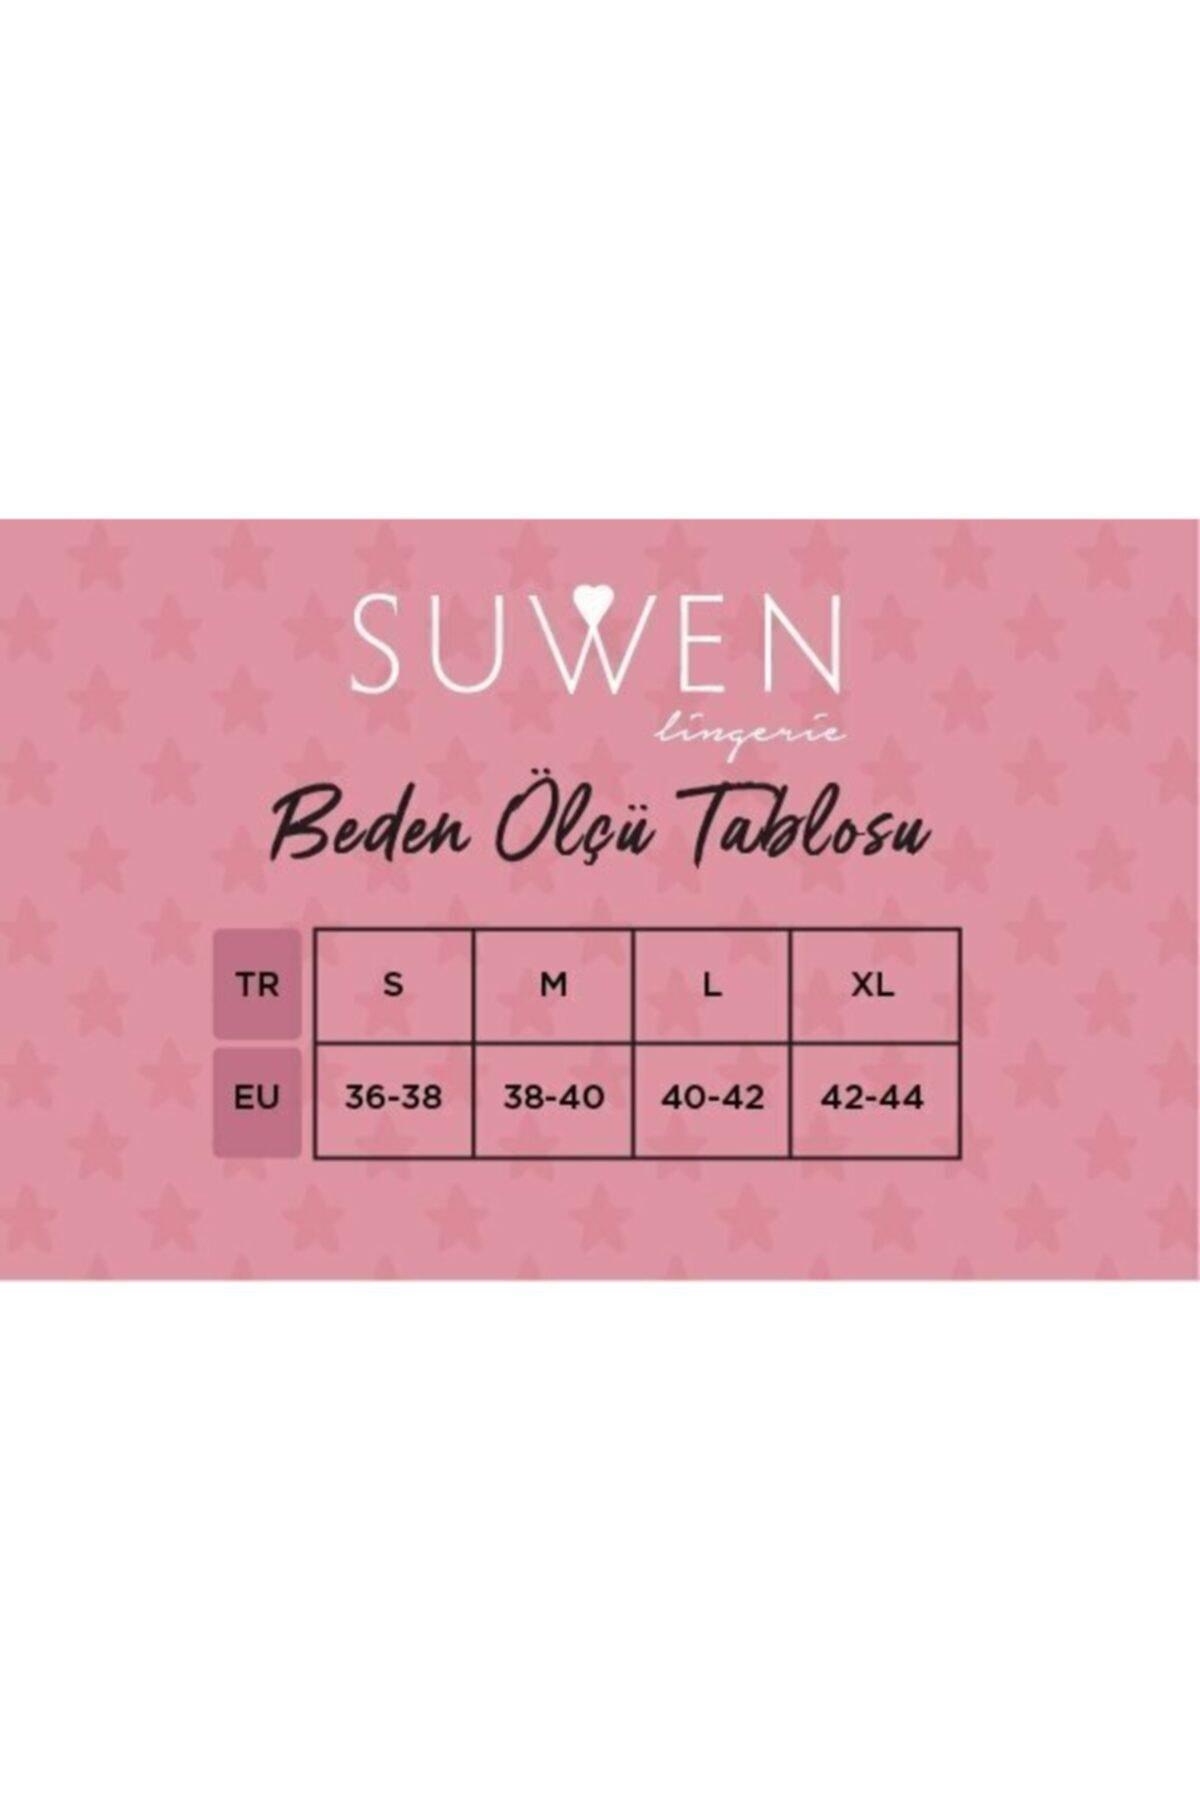 SUWEN Soft Touch Koton Ince Askili Atlet 2 Li Paket 2